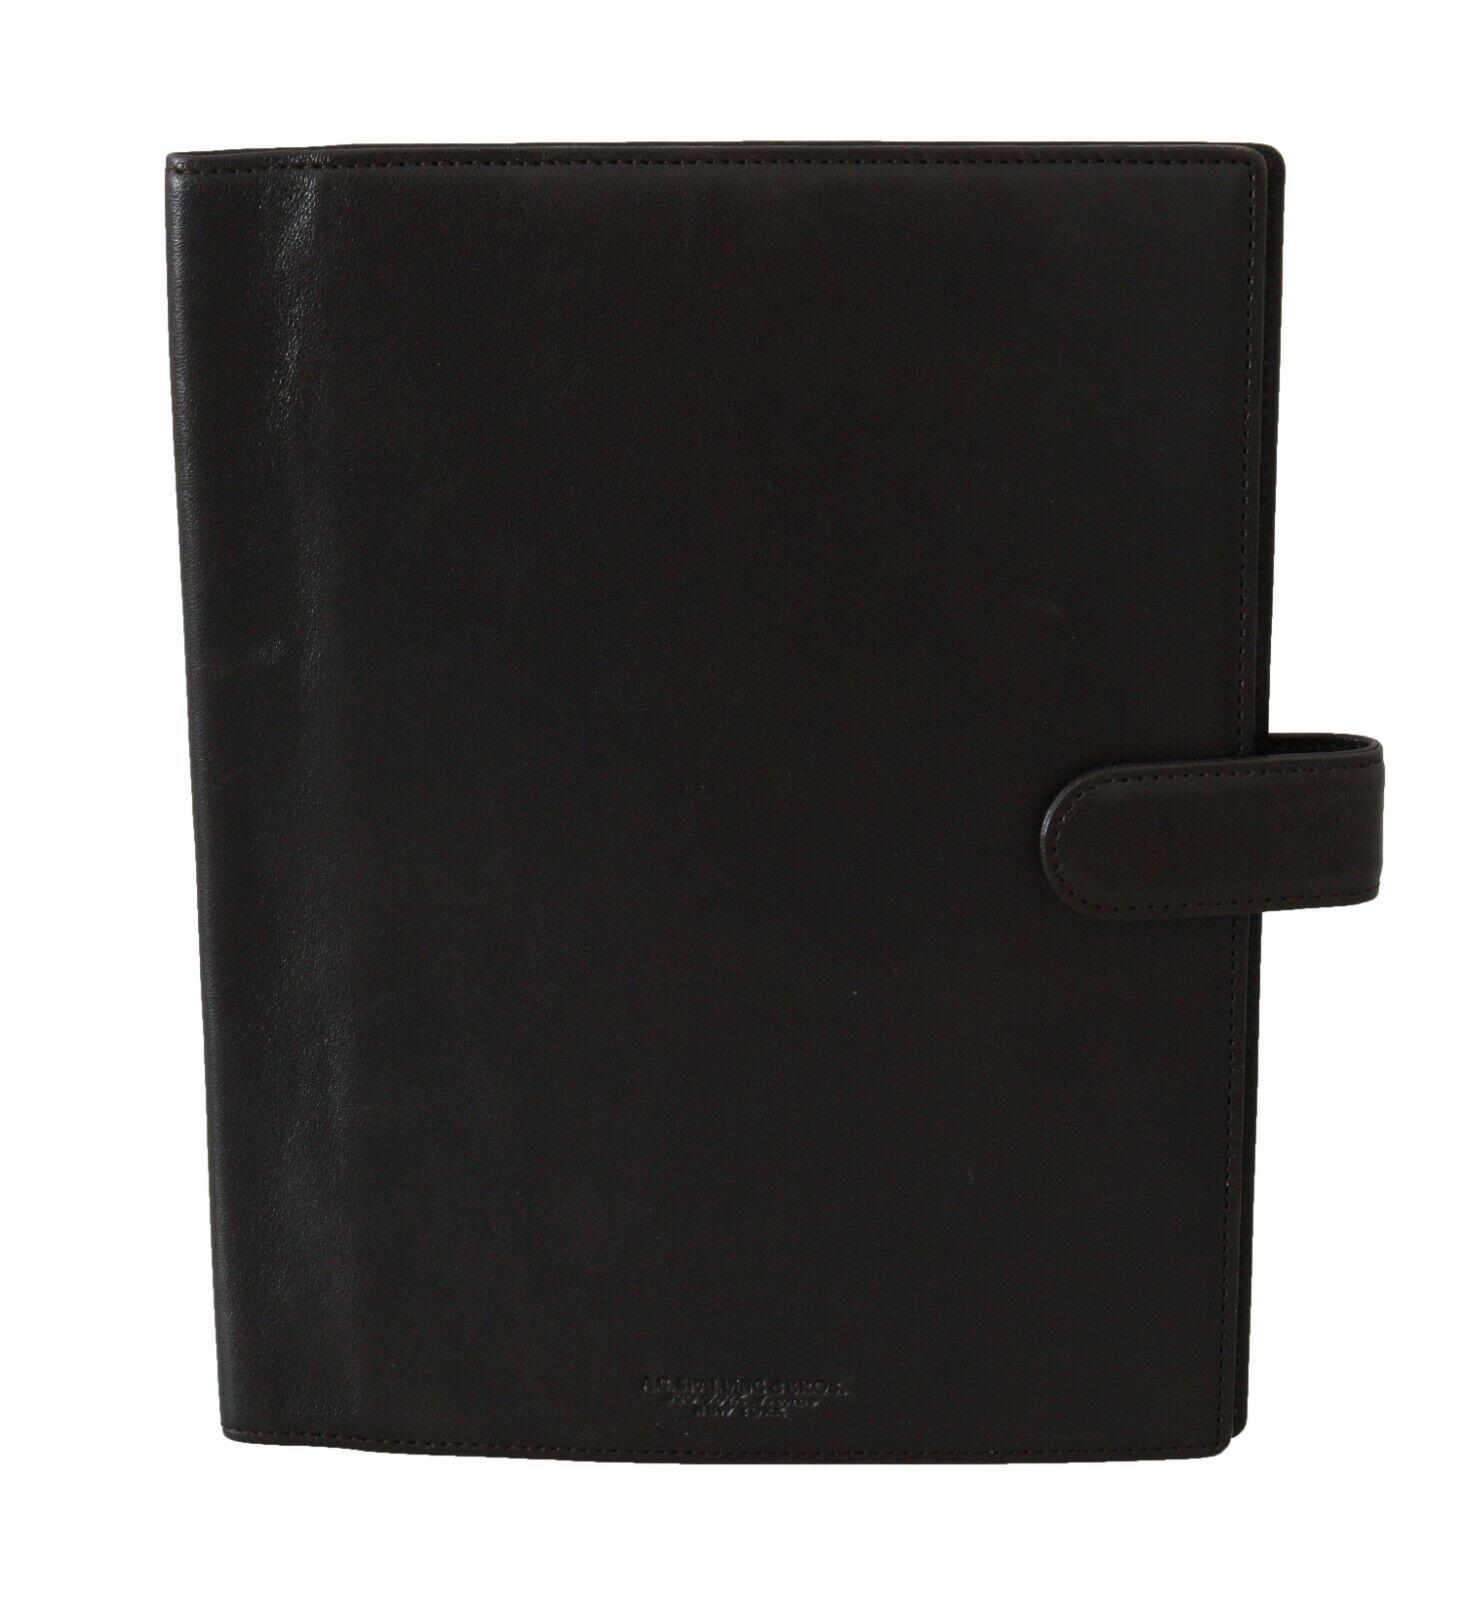 A.G SPALDING & BROS Wallet Leather Brown Bifold Travel Holder Men Logo